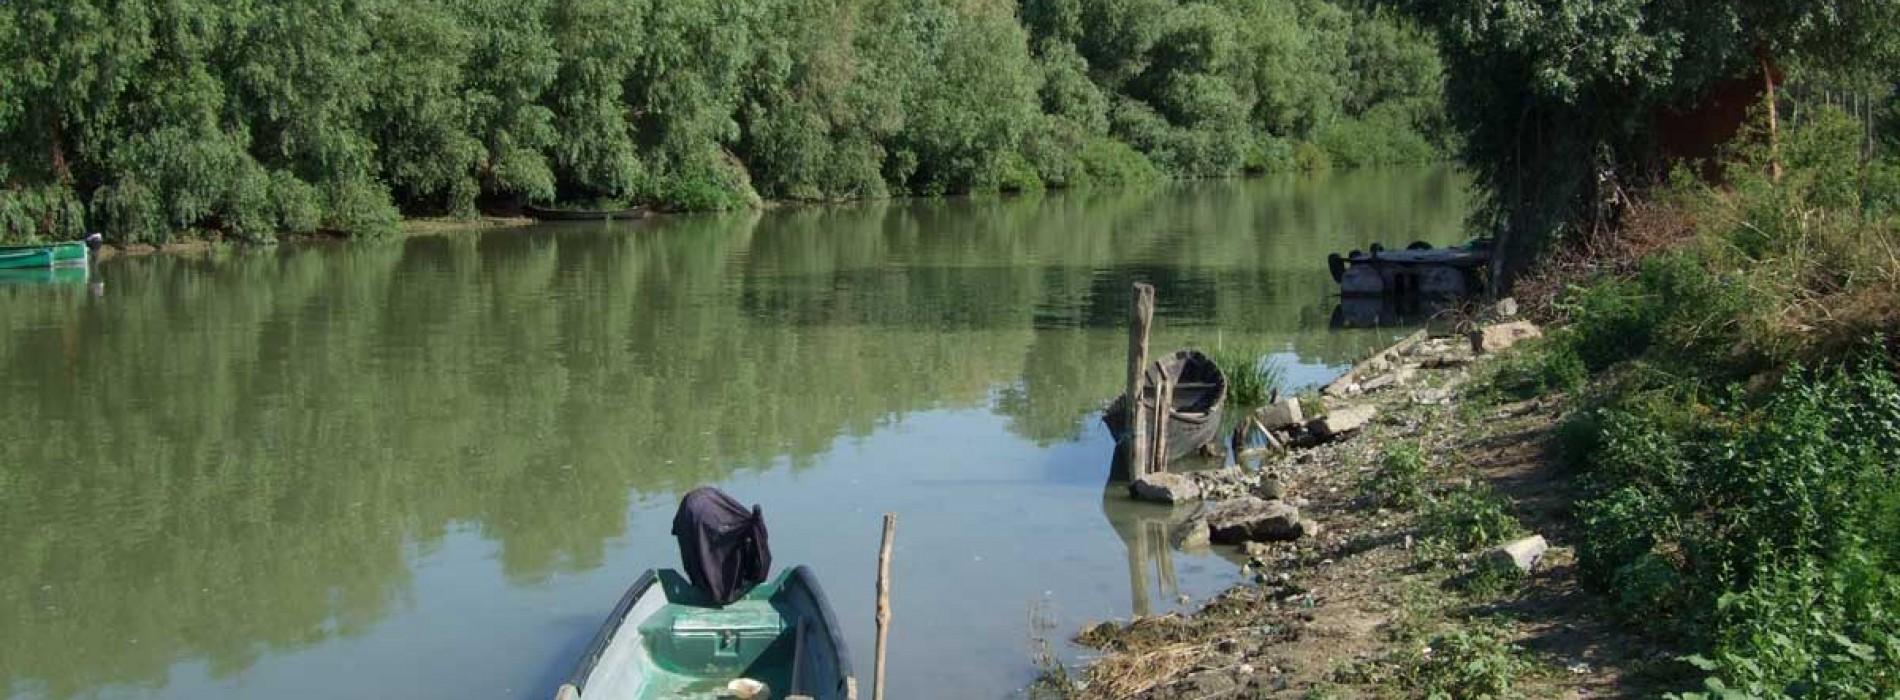 Pescuitul pe canale